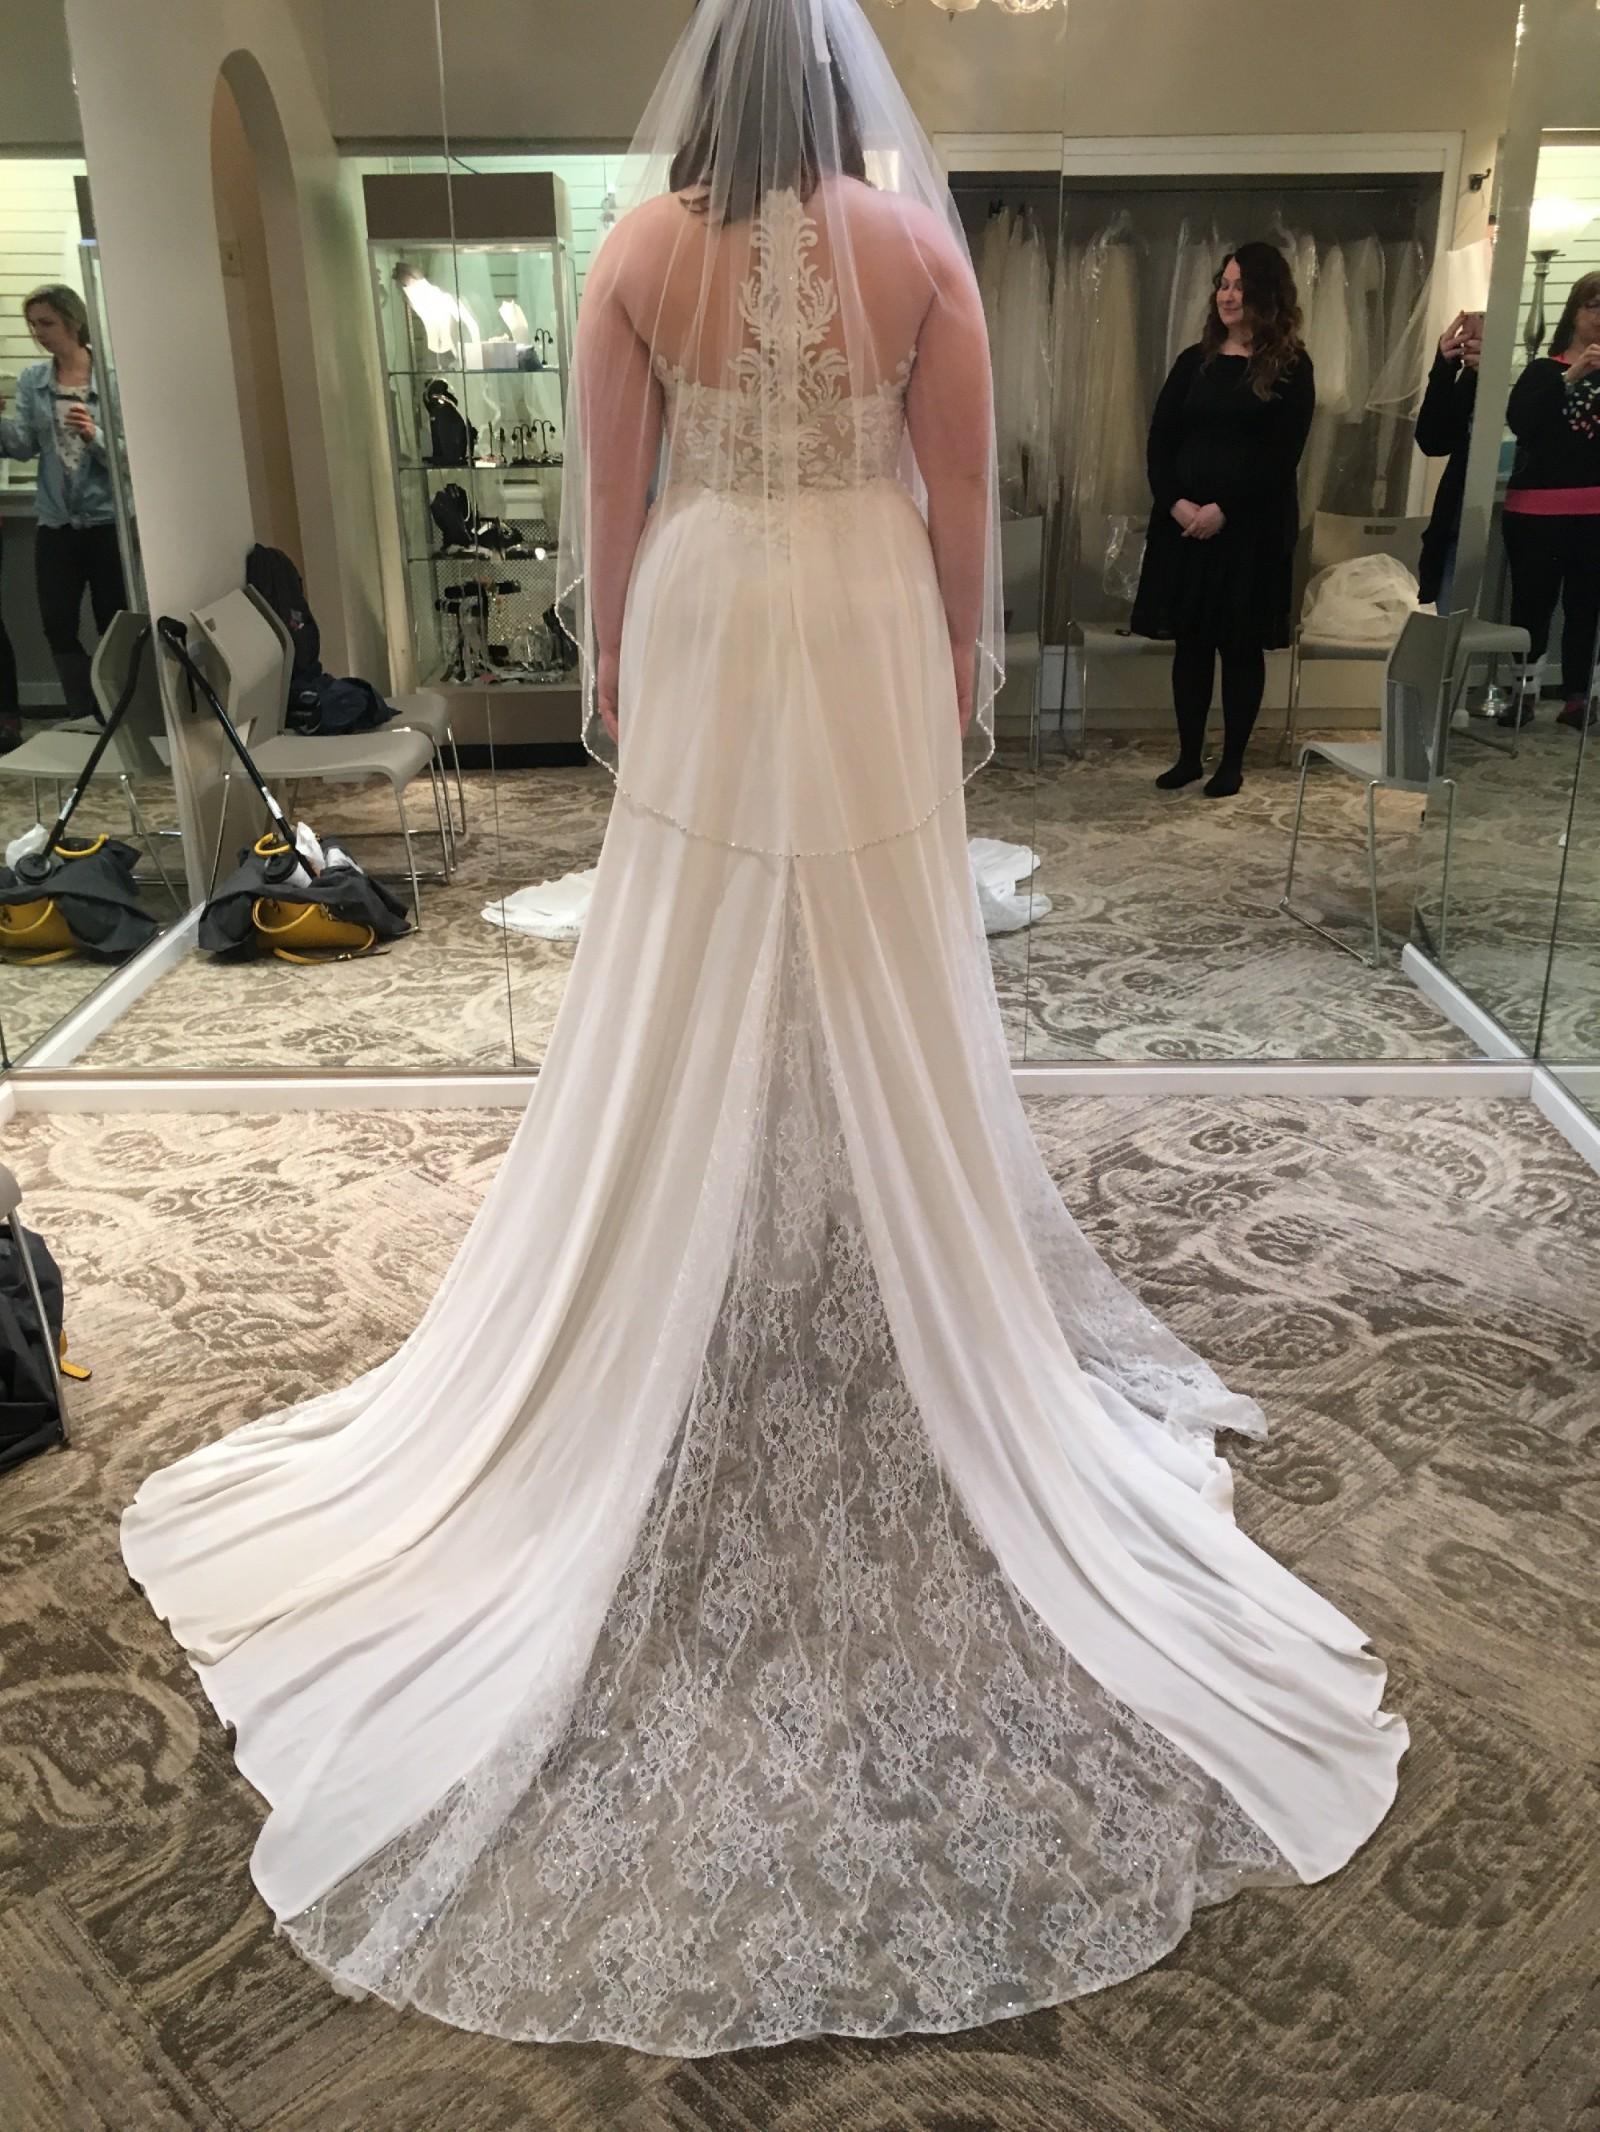 Plus Size Wedding Dresses & Bridal Gowns   Allure Bridals